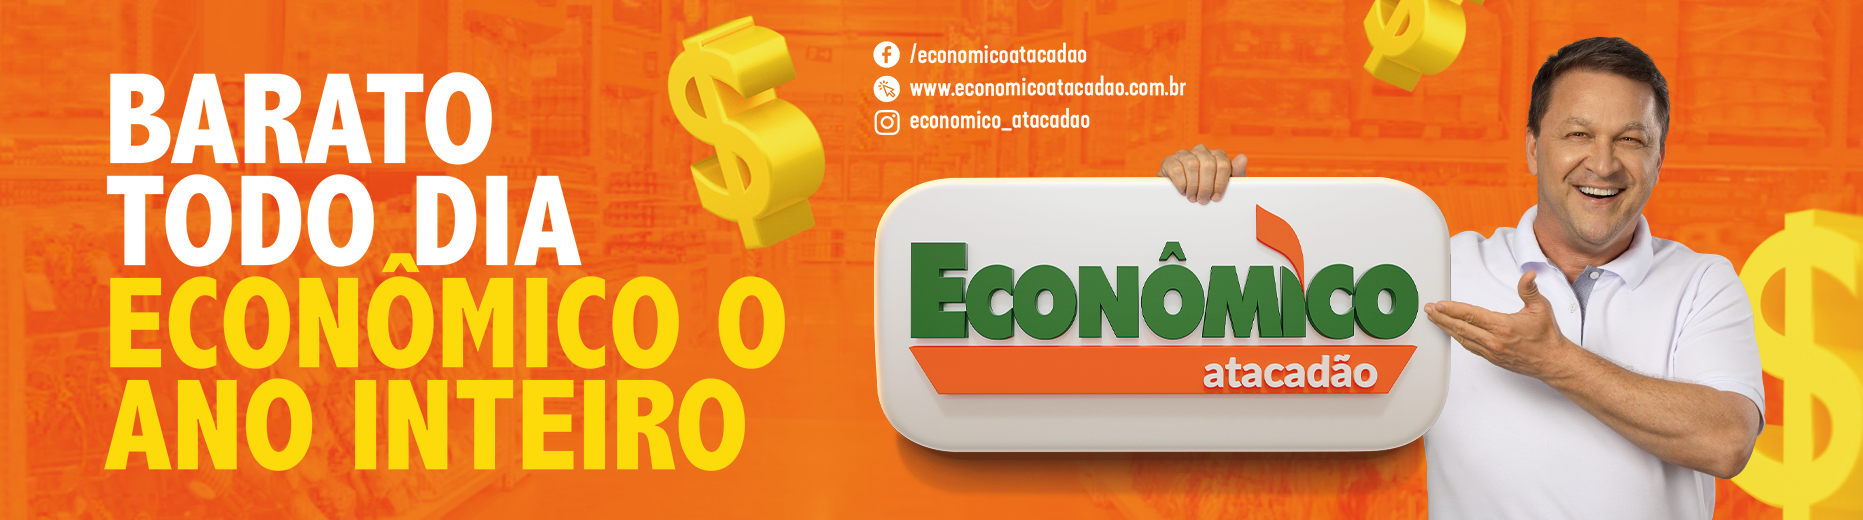 Site Econômico